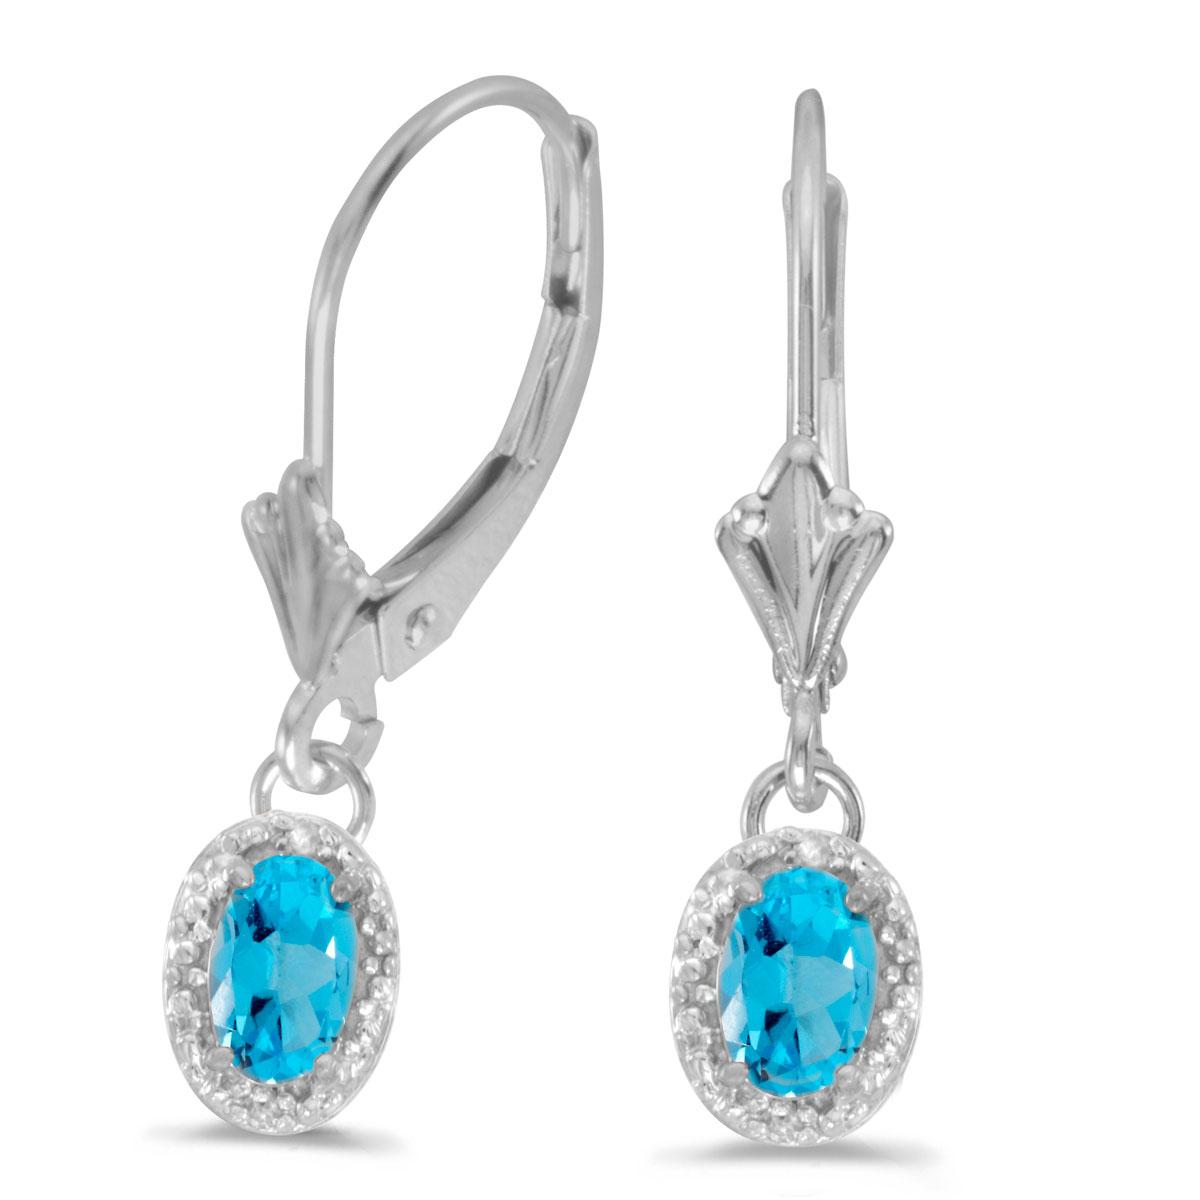 14k White Gold Oval Blue Topaz And Diamond Leverback Earrings